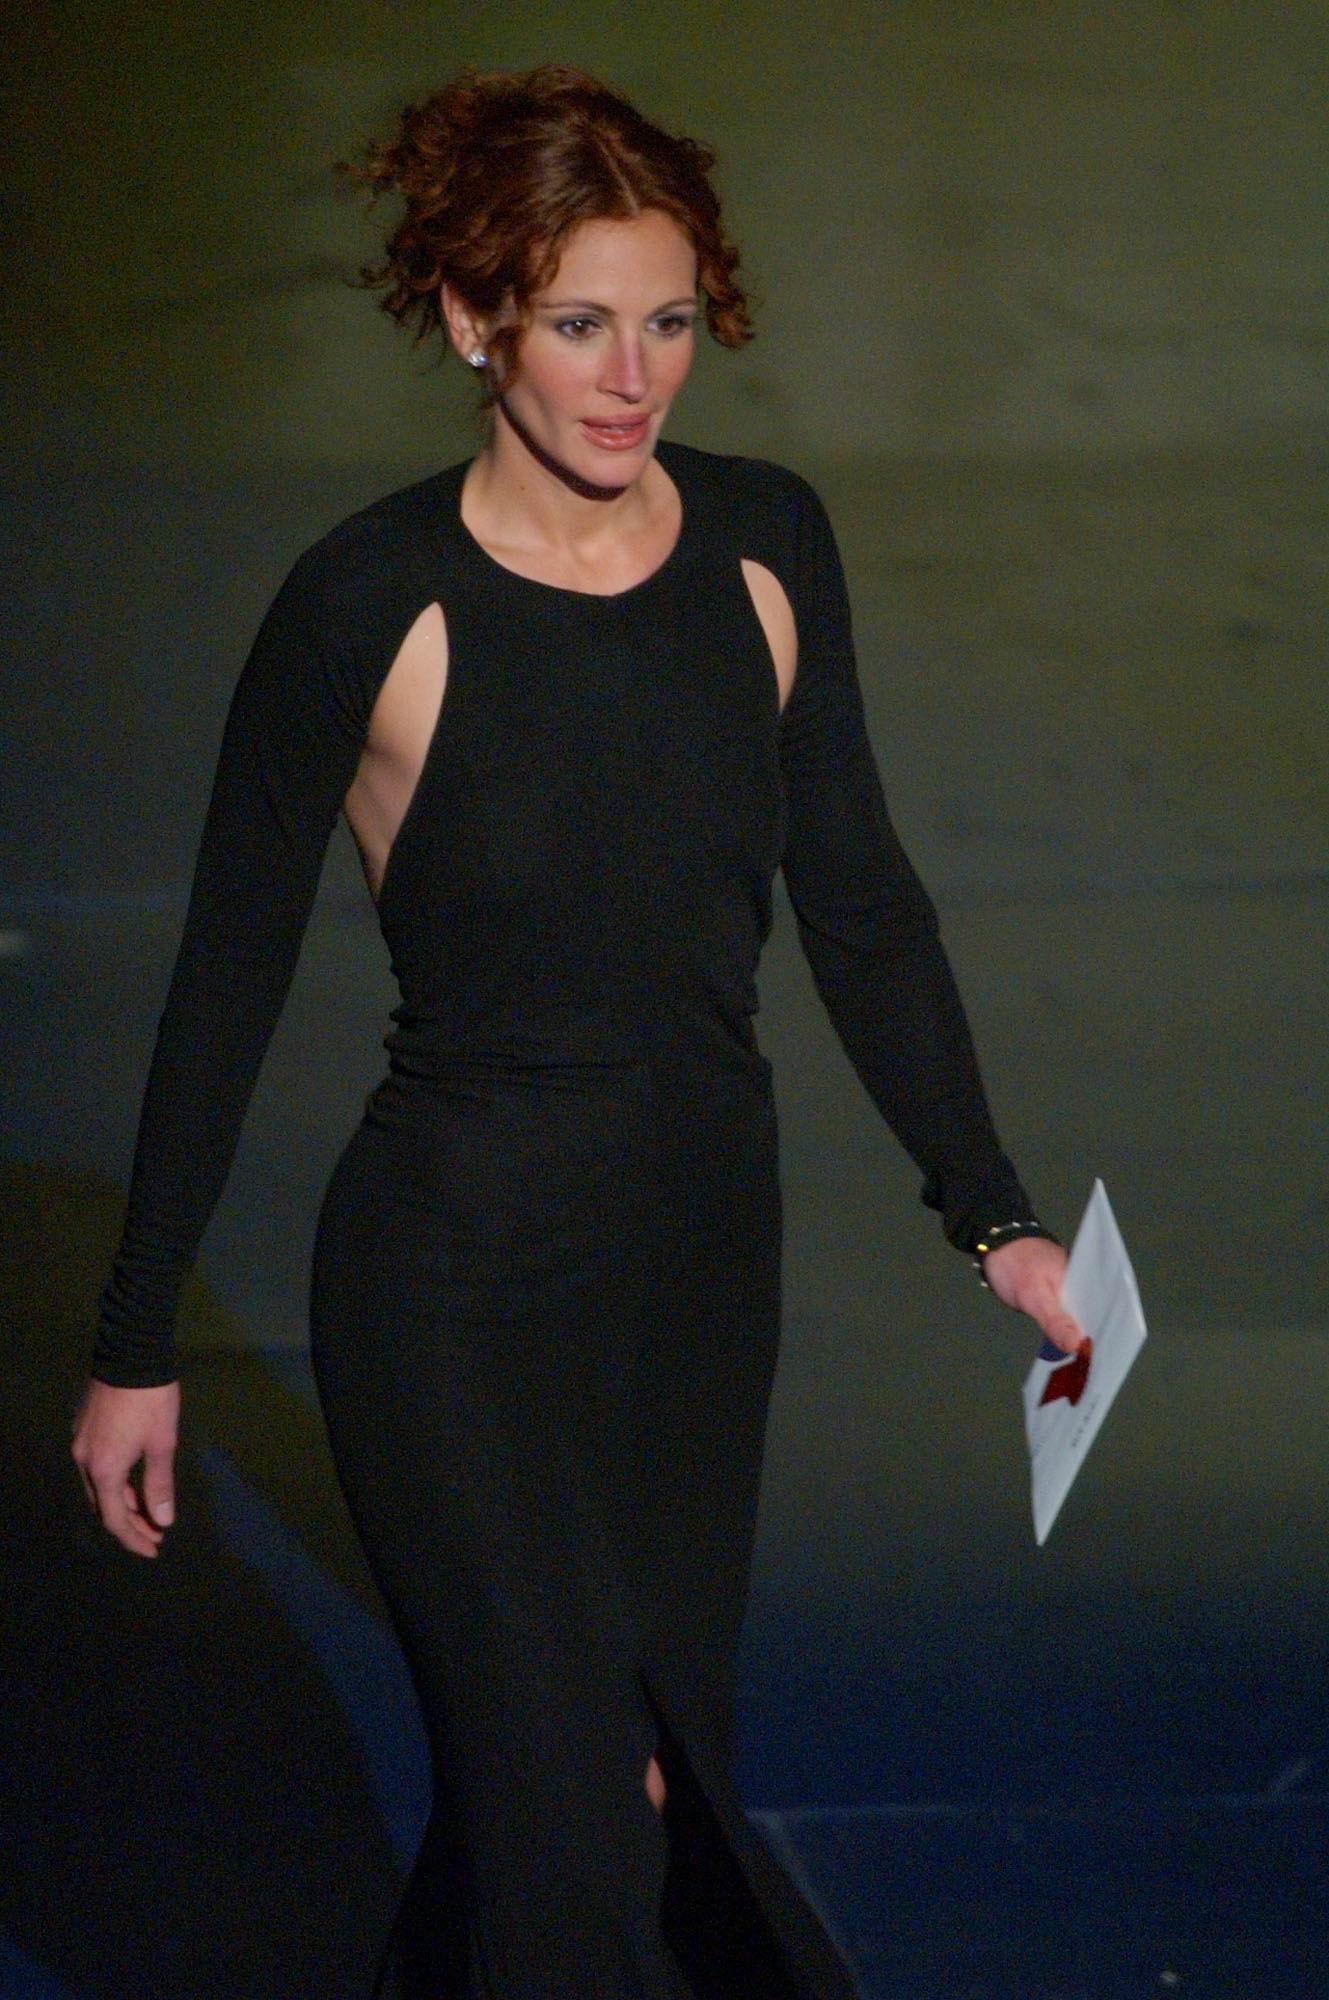 Movie Wonder Julia Roberts >> Julia Roberts nude - Page 8 pictures, naked, oops, topless, bikini, video, nipple